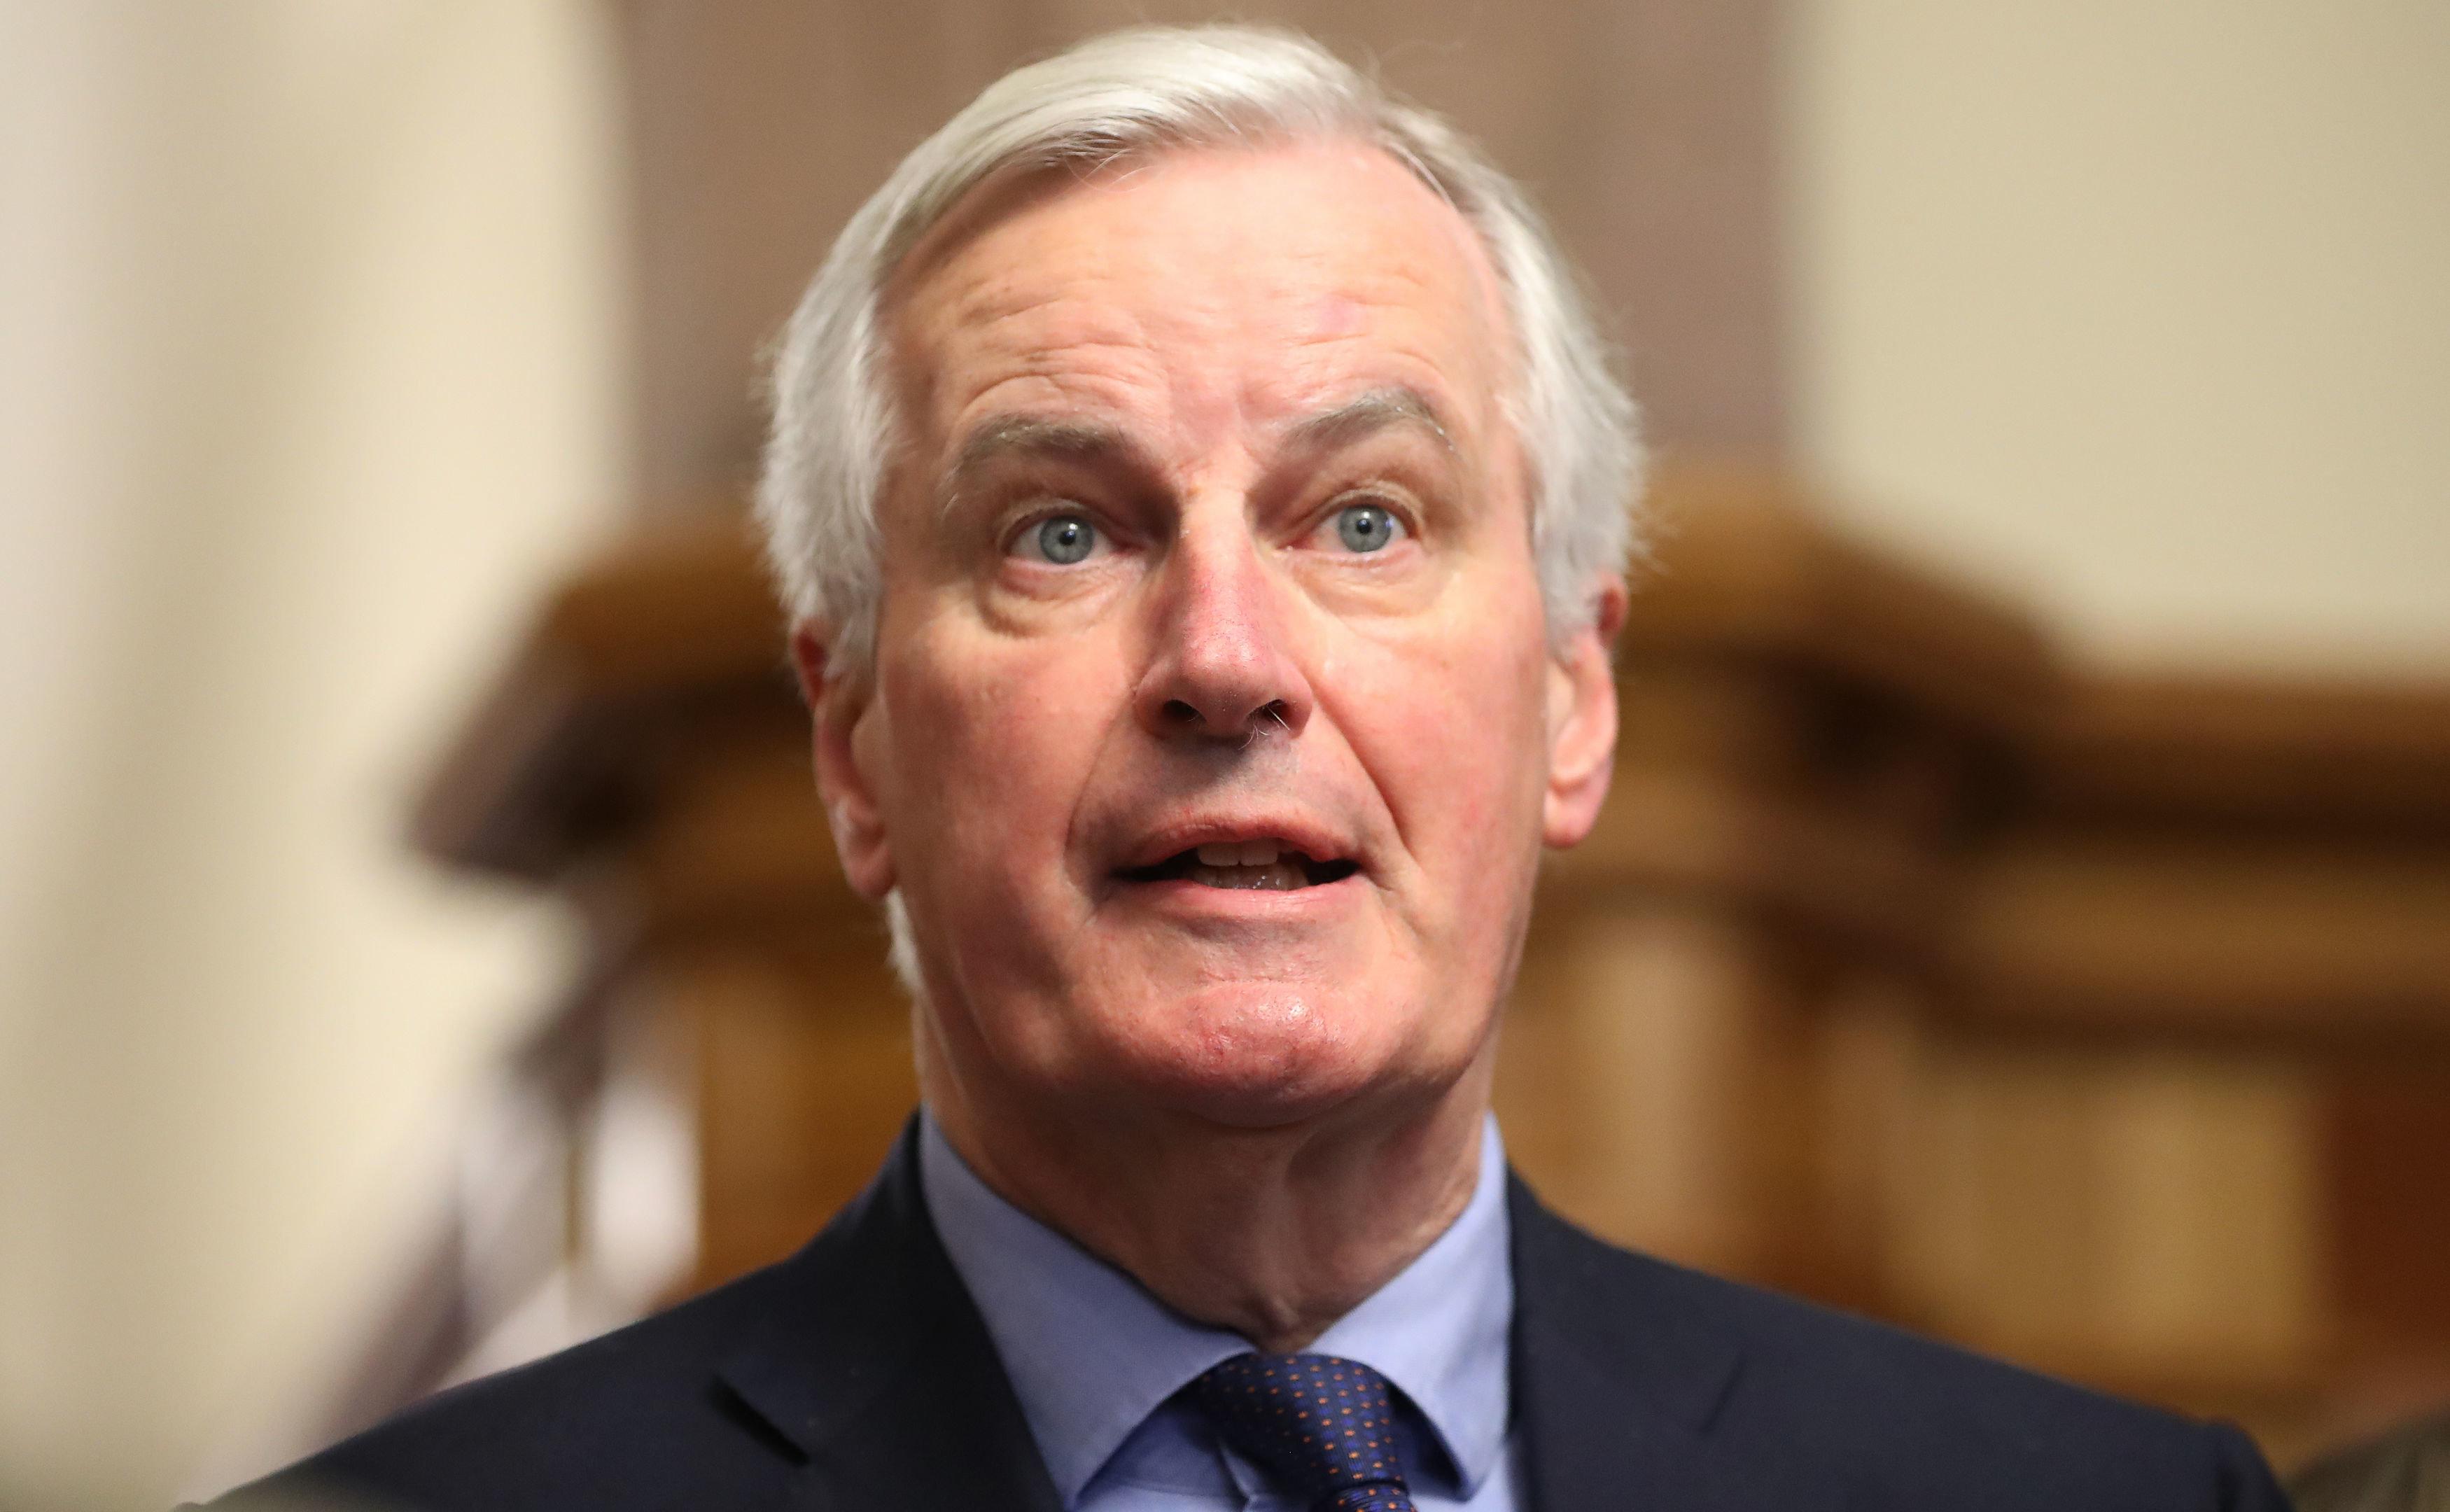 EU To Offer Compromise On Irish Border, Chief Negotiator Michel Barnier